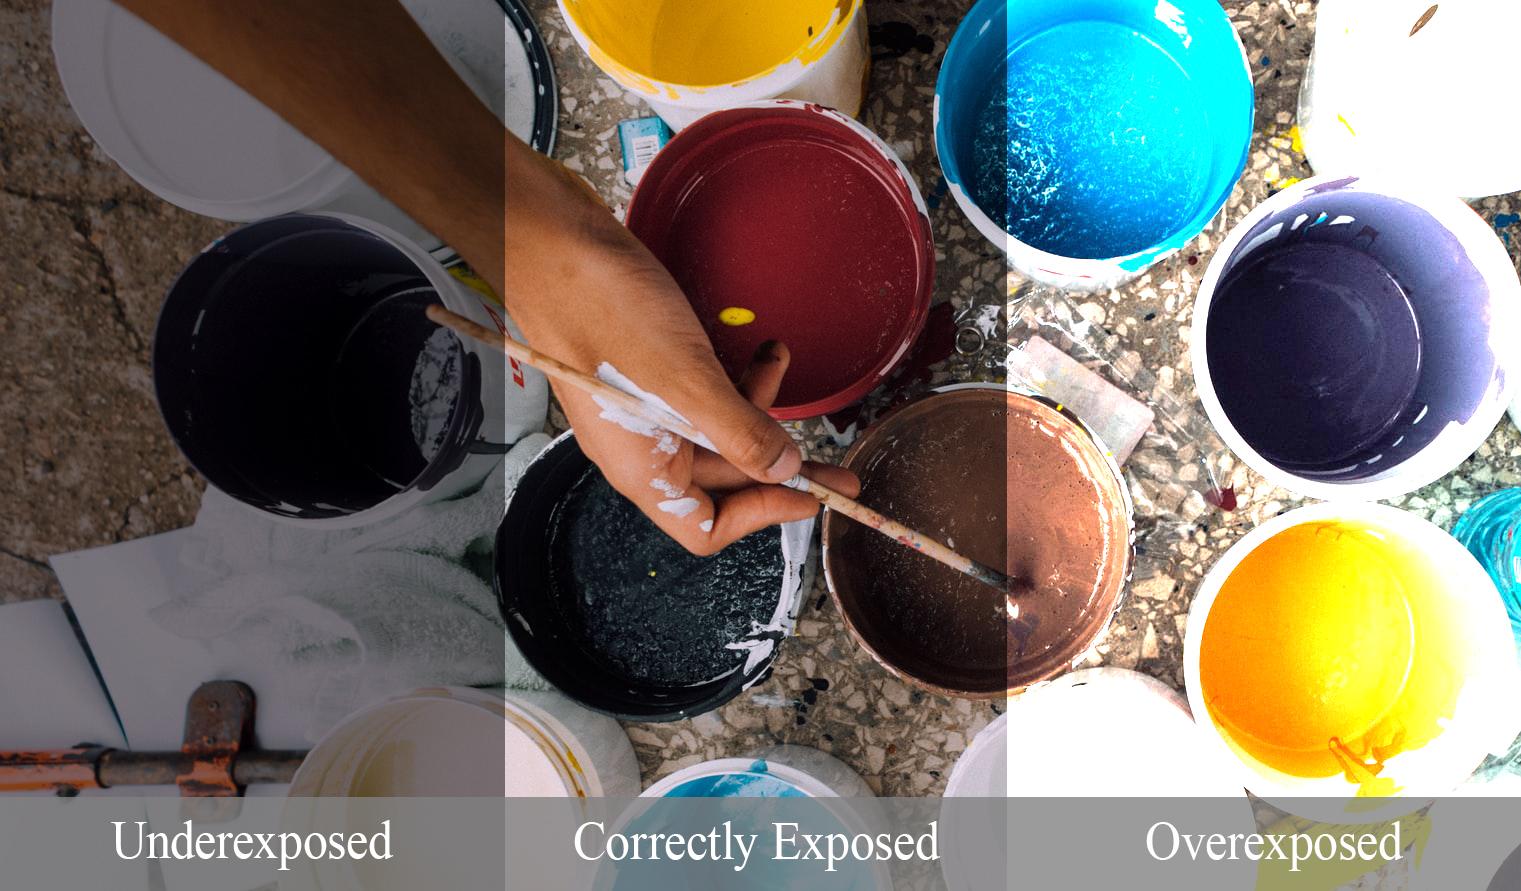 example of exposures